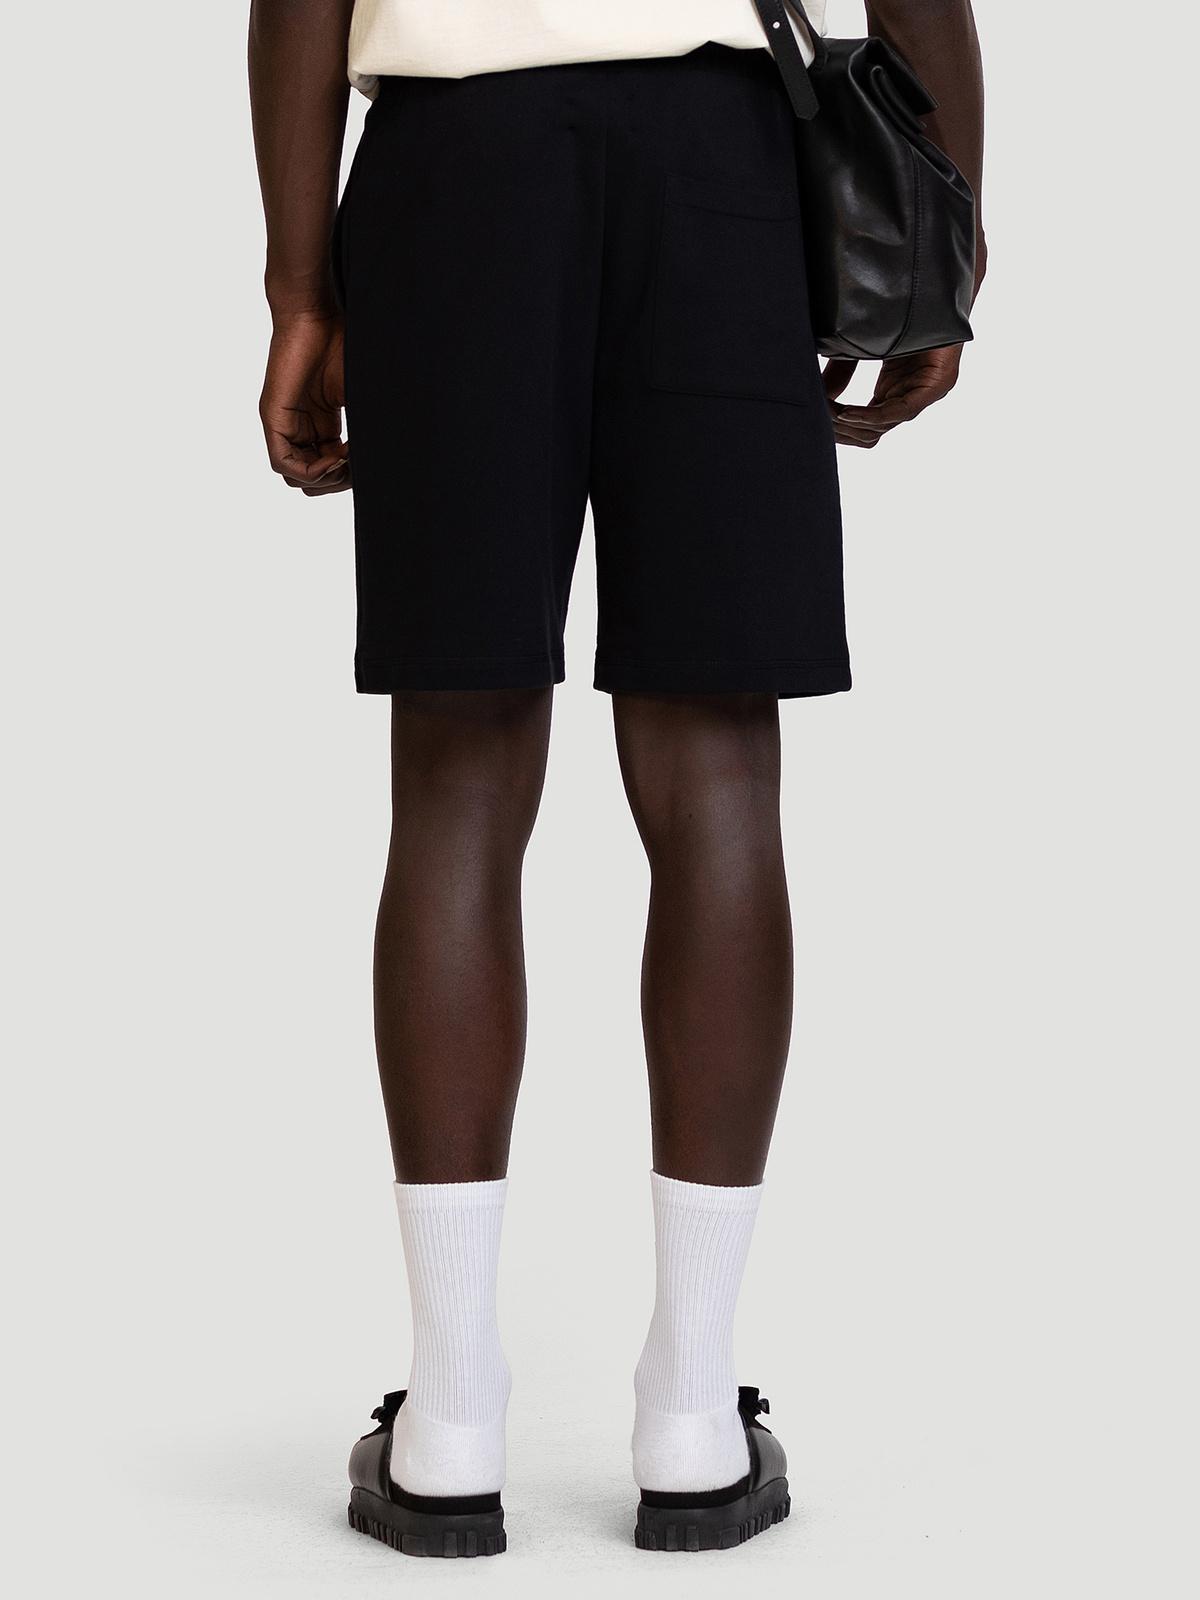 M. Oslo Shorts Black 3